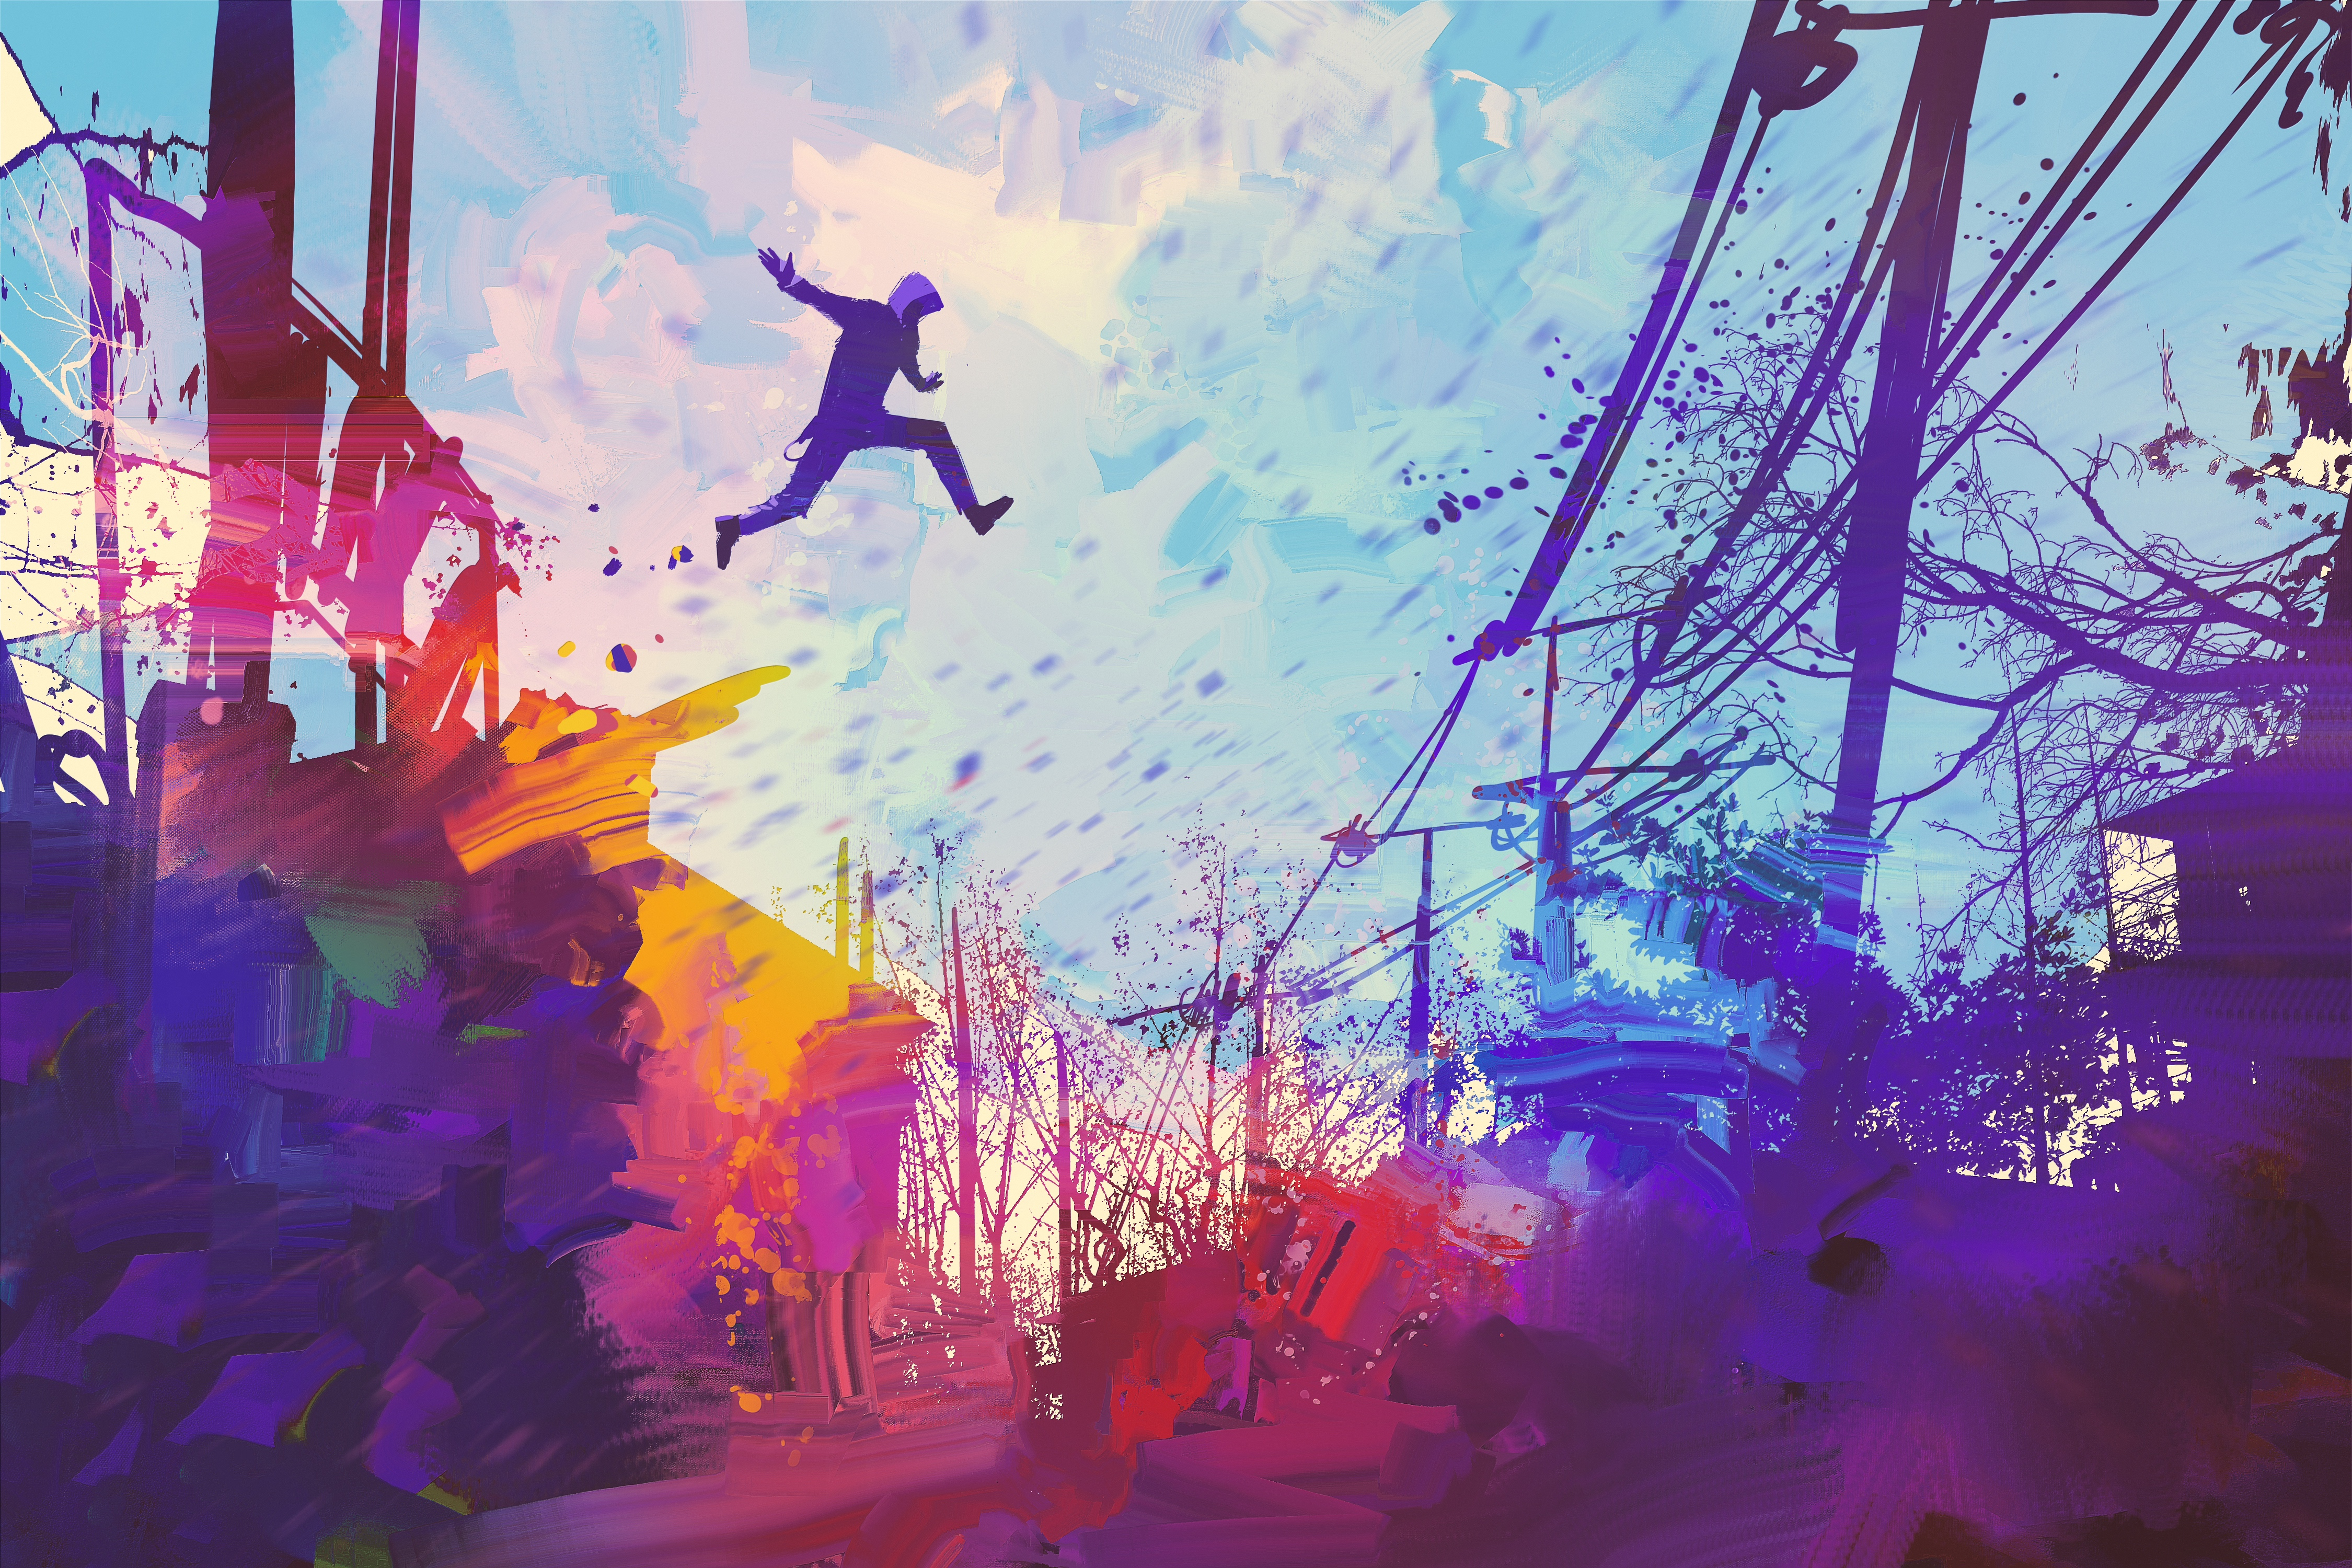 General 4500x3000 digital art city men parkour abstract colorful